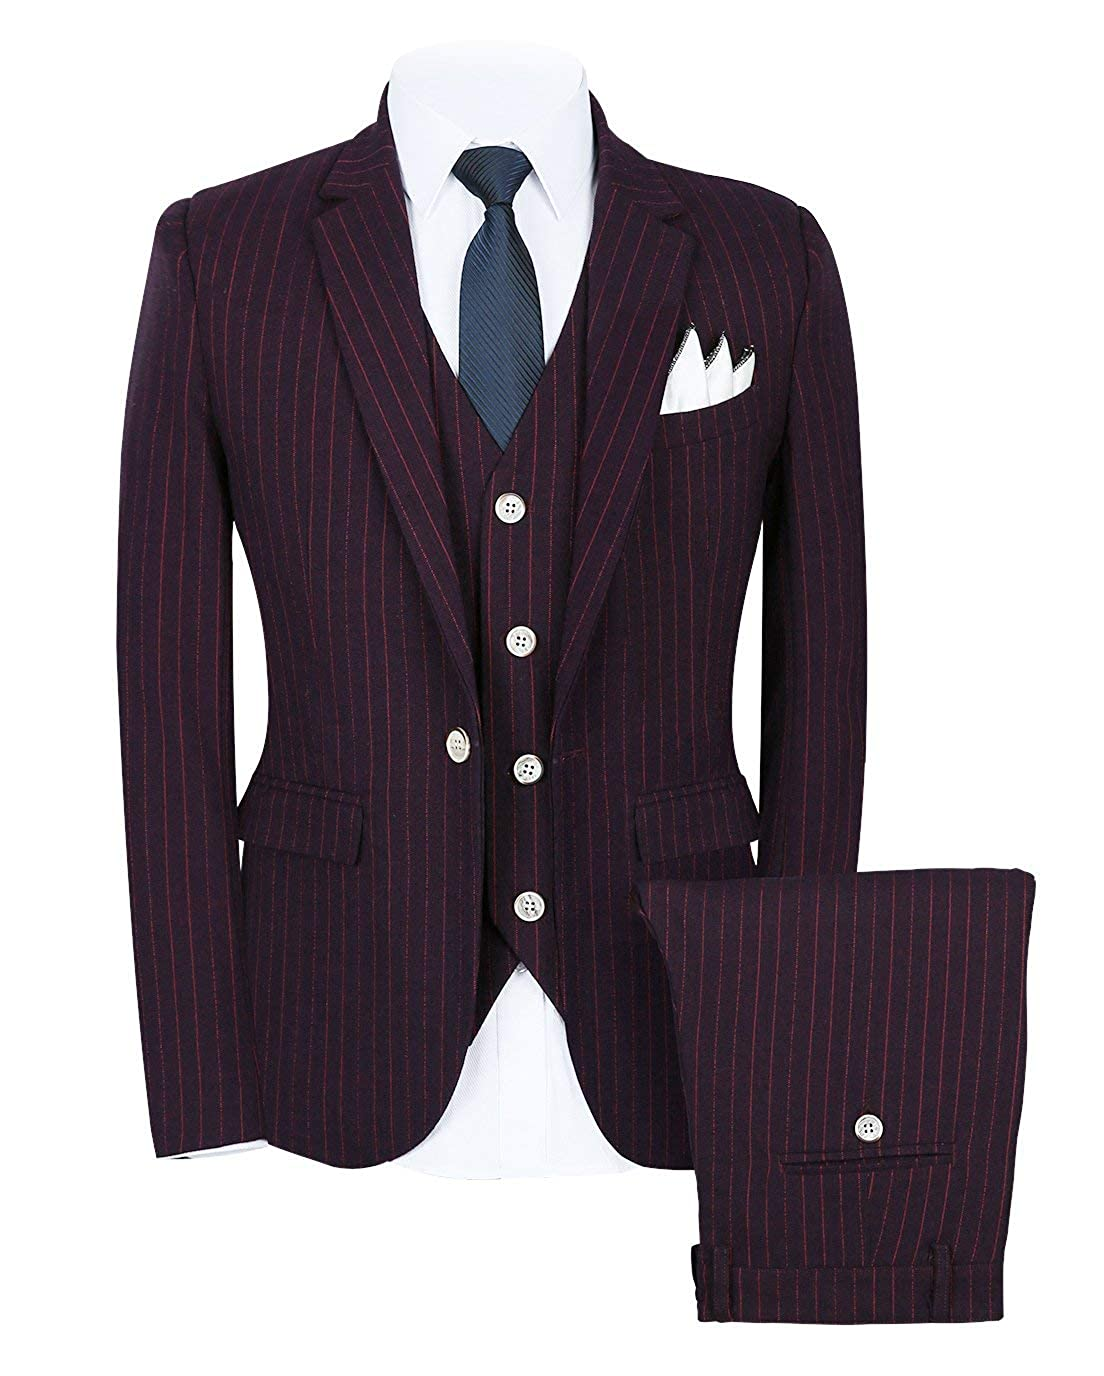 YYI Mens Stripe Suit 3 Pieces Wedding Formal Tuxedo Notch Lapel Jacket /& Trousers /& Waistcoat